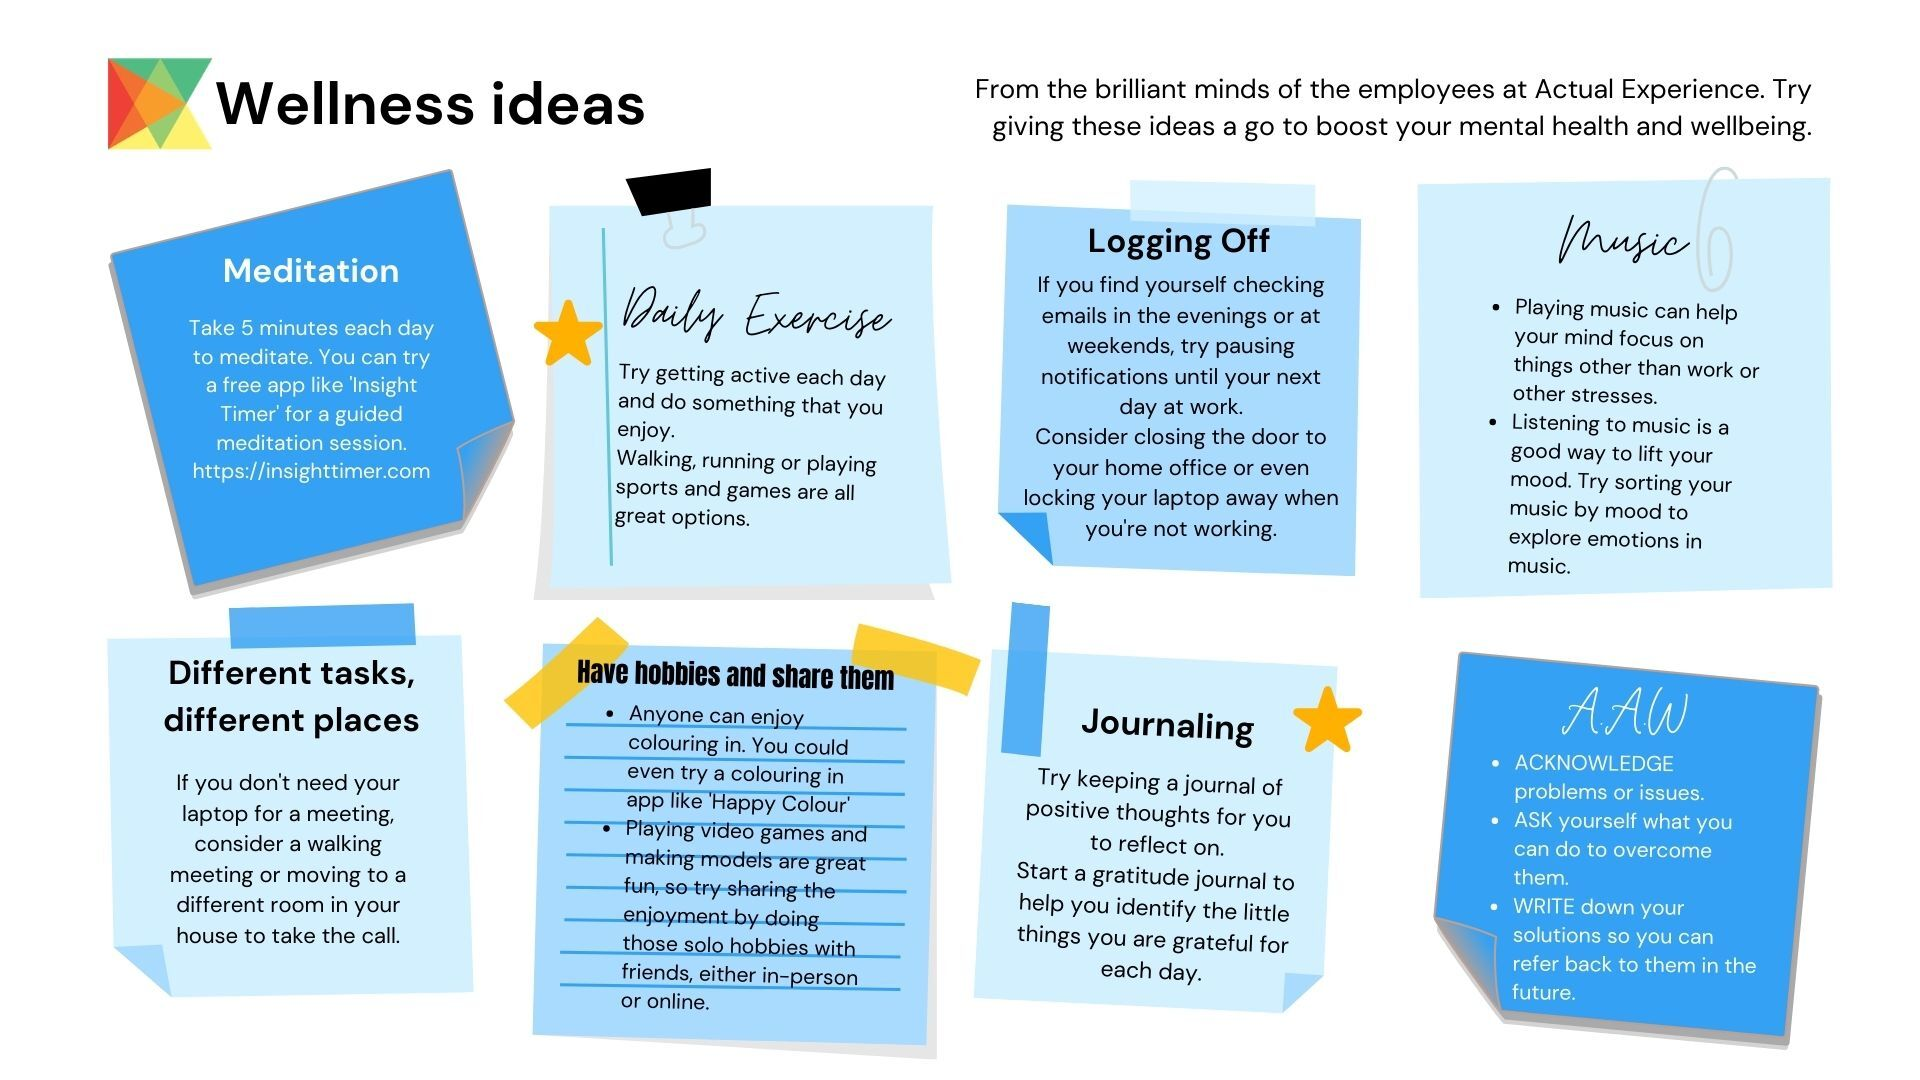 Wellness ideas